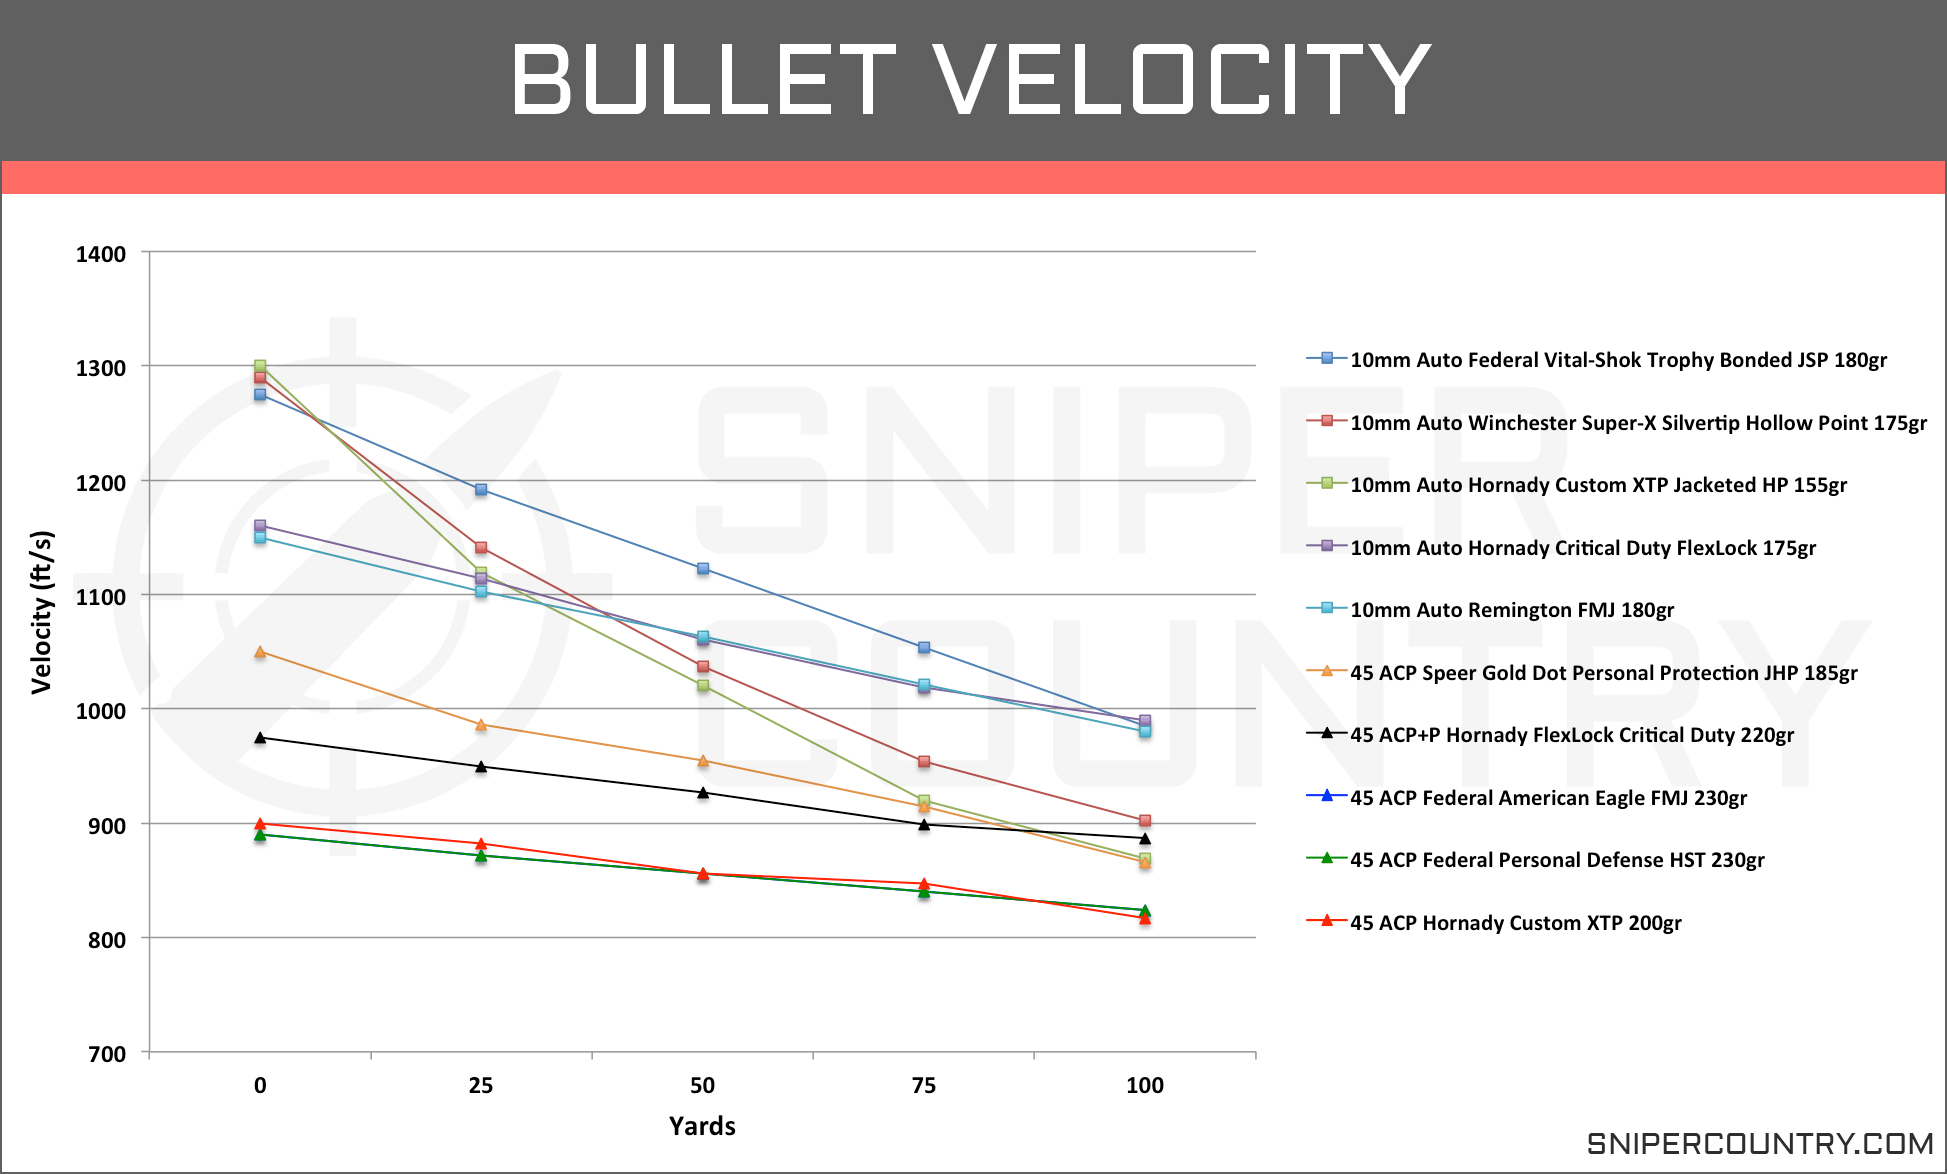 Bullet Velocity 10mm vs .45 ACP